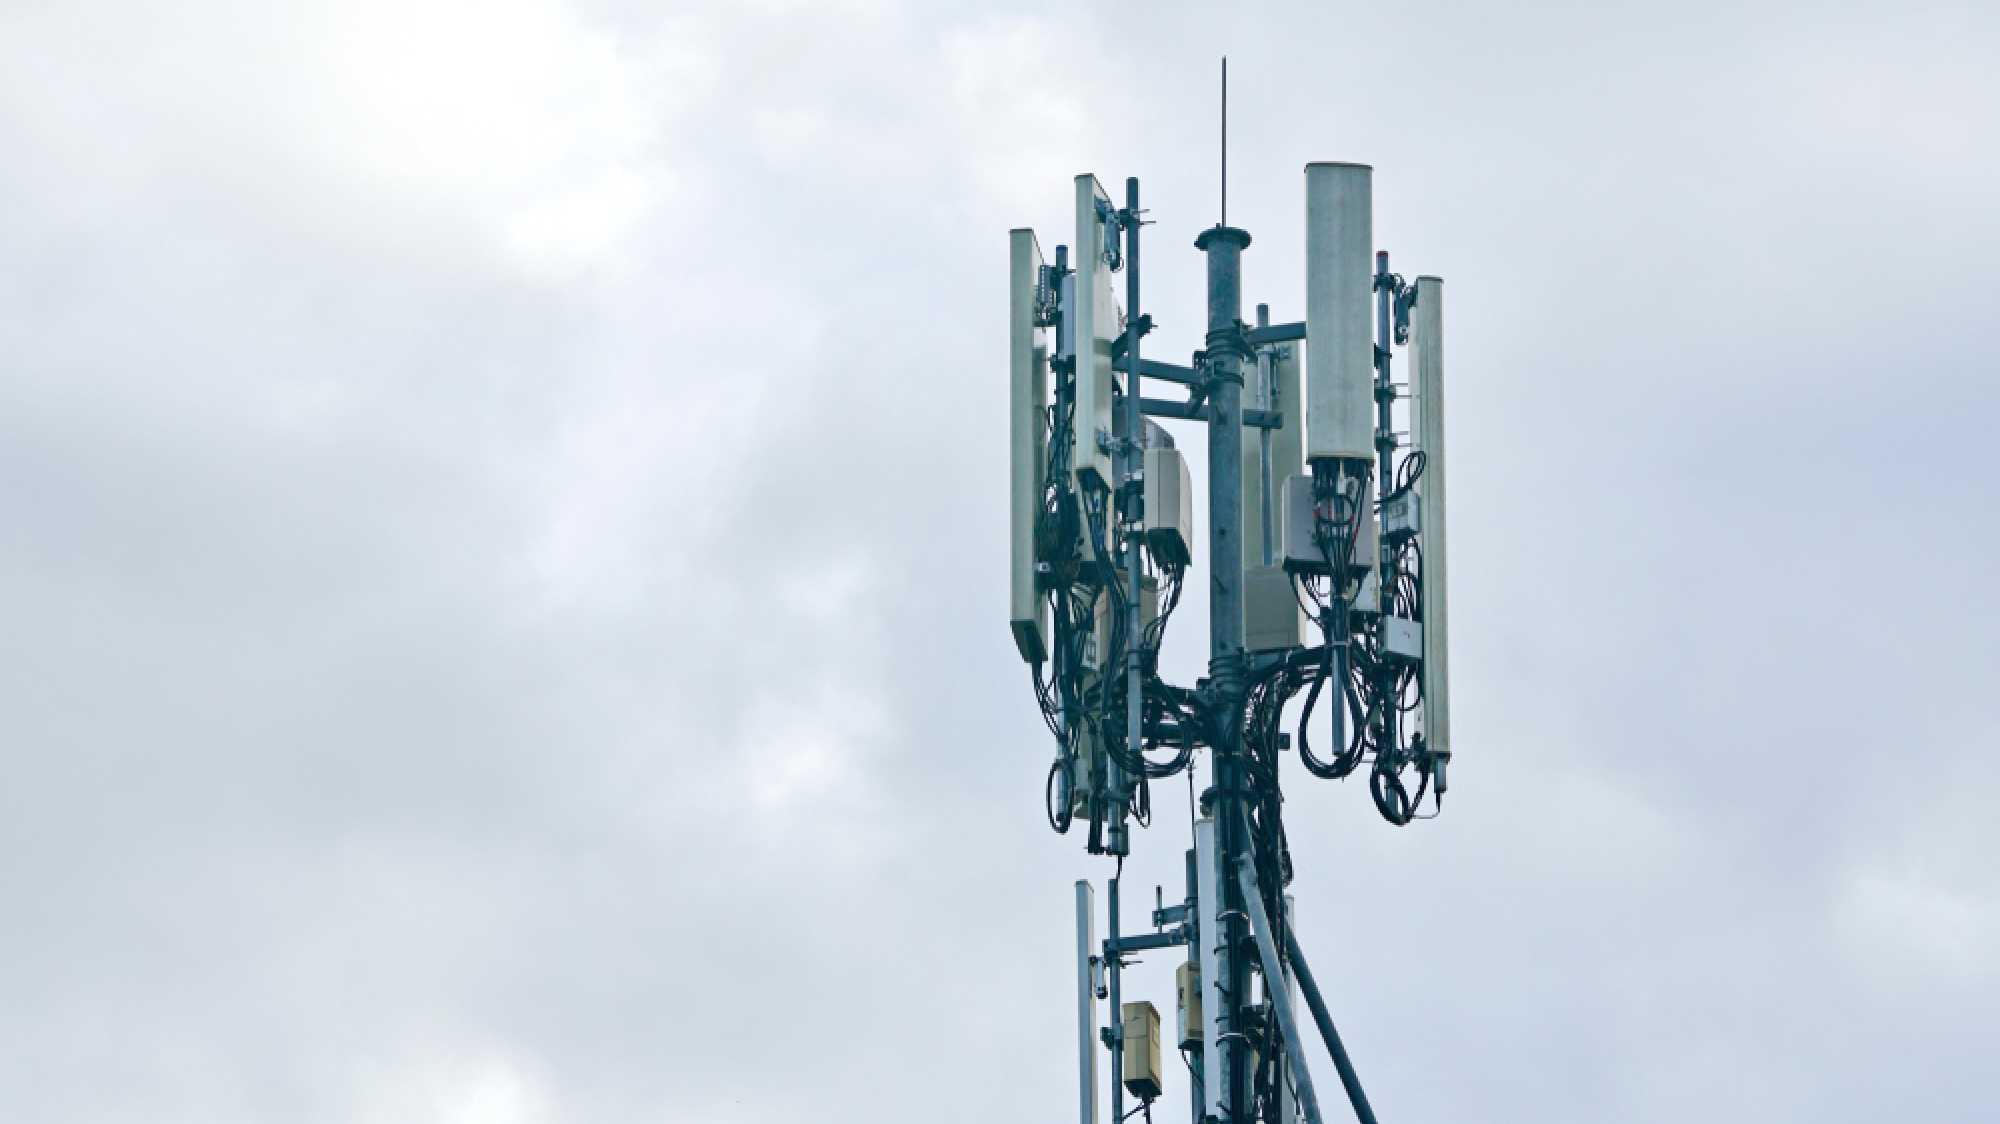 Bundestag fordert Infrastrukturgesellschaft zum Mobilfunkausbau